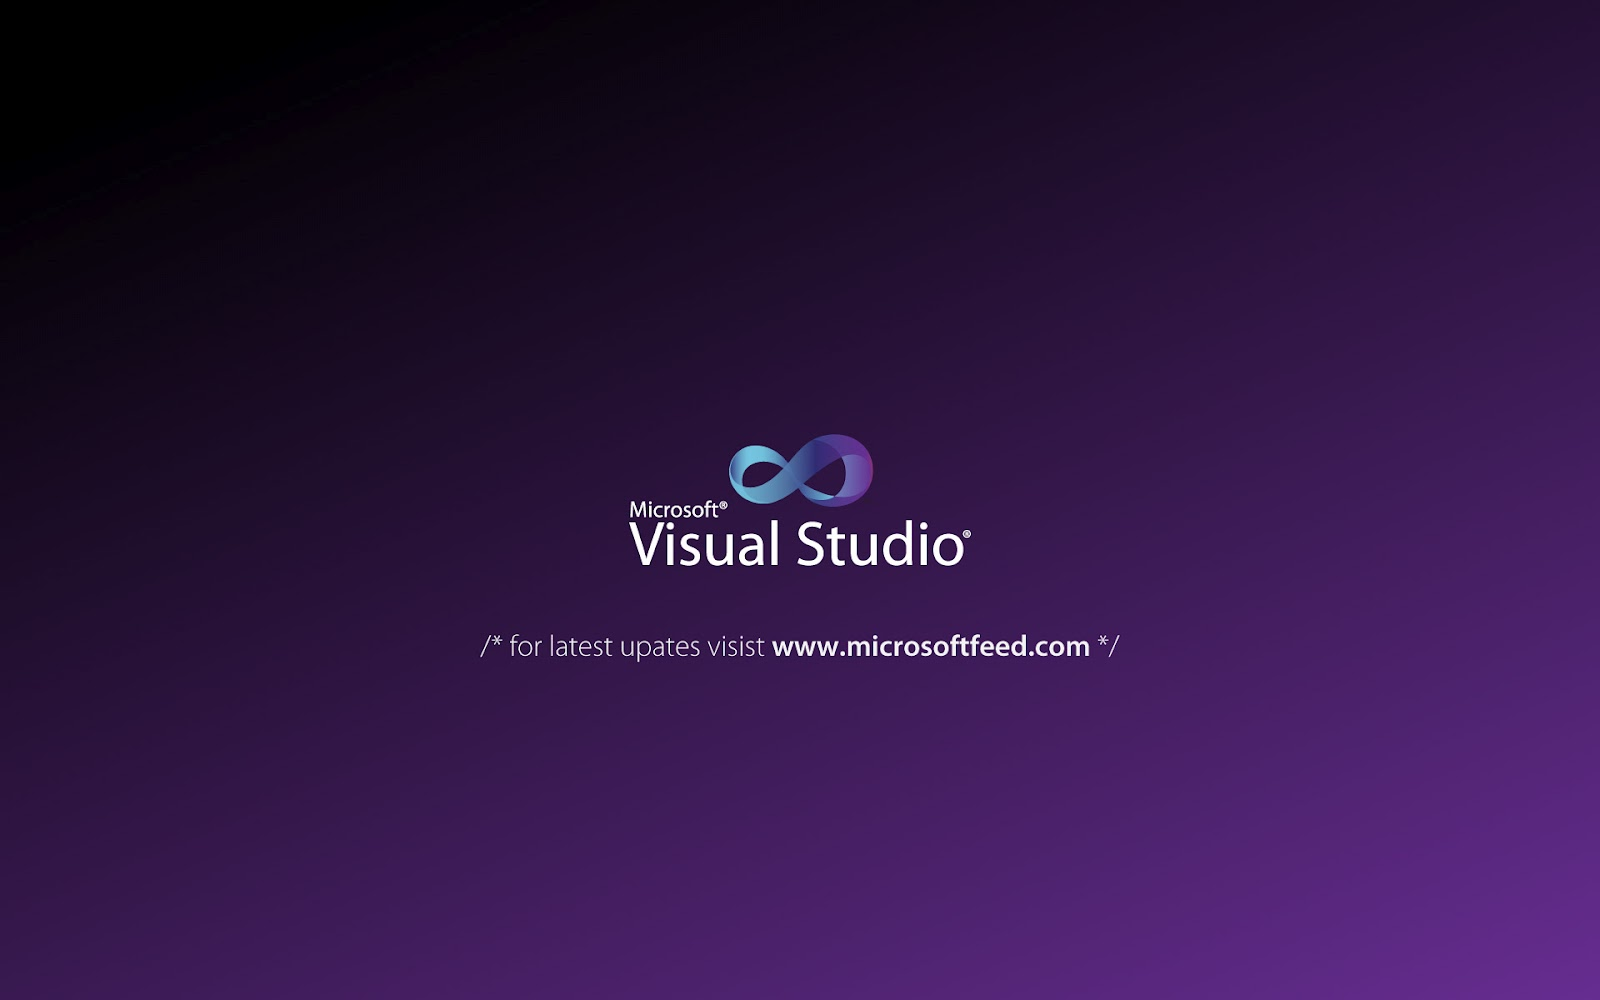 visual studio 2012 wallpaper - photo #6